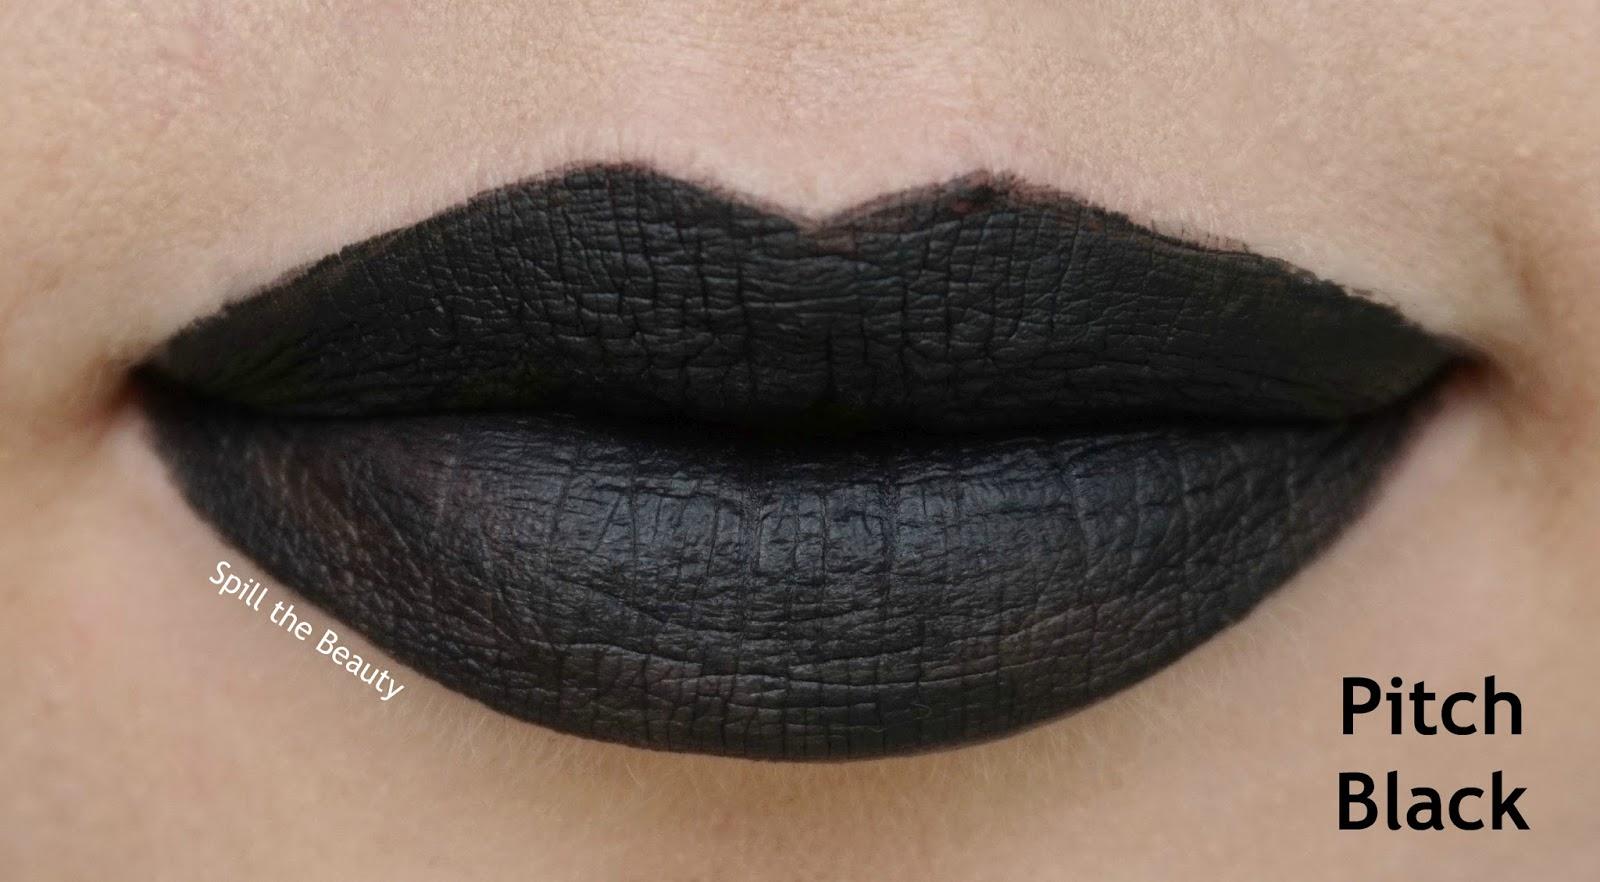 rimmel london stay matte liquid lip color review swatches 840 pitch black